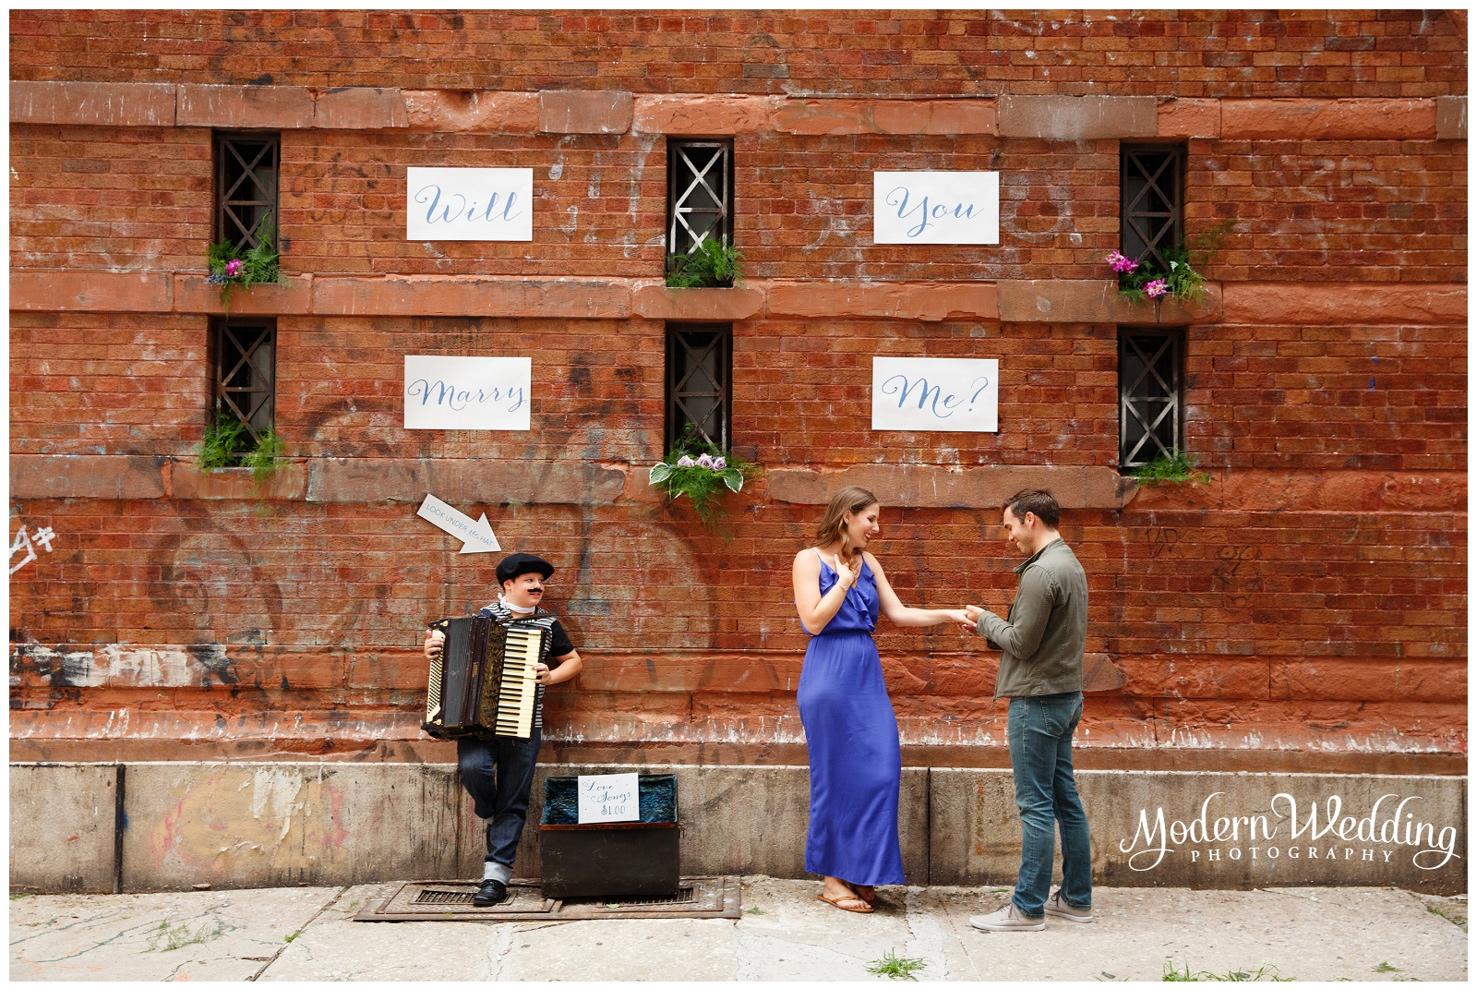 Modern Wedding Photography 20